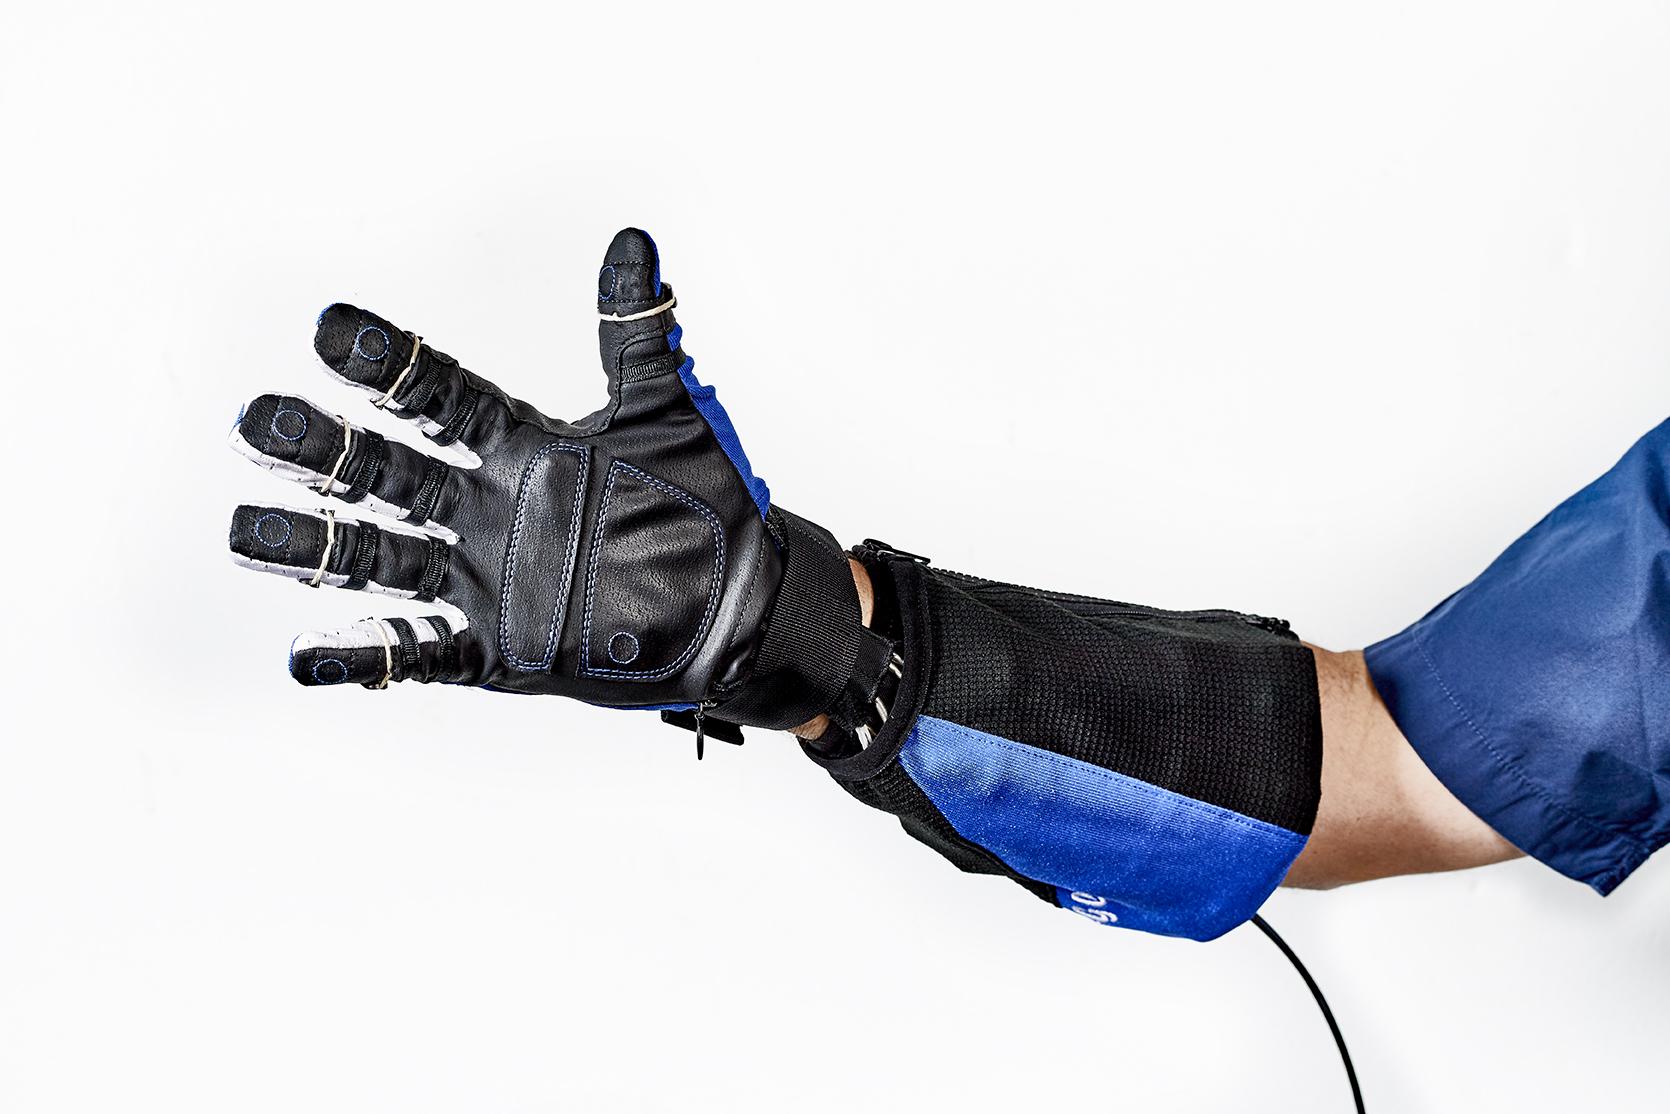 New robotic glove.